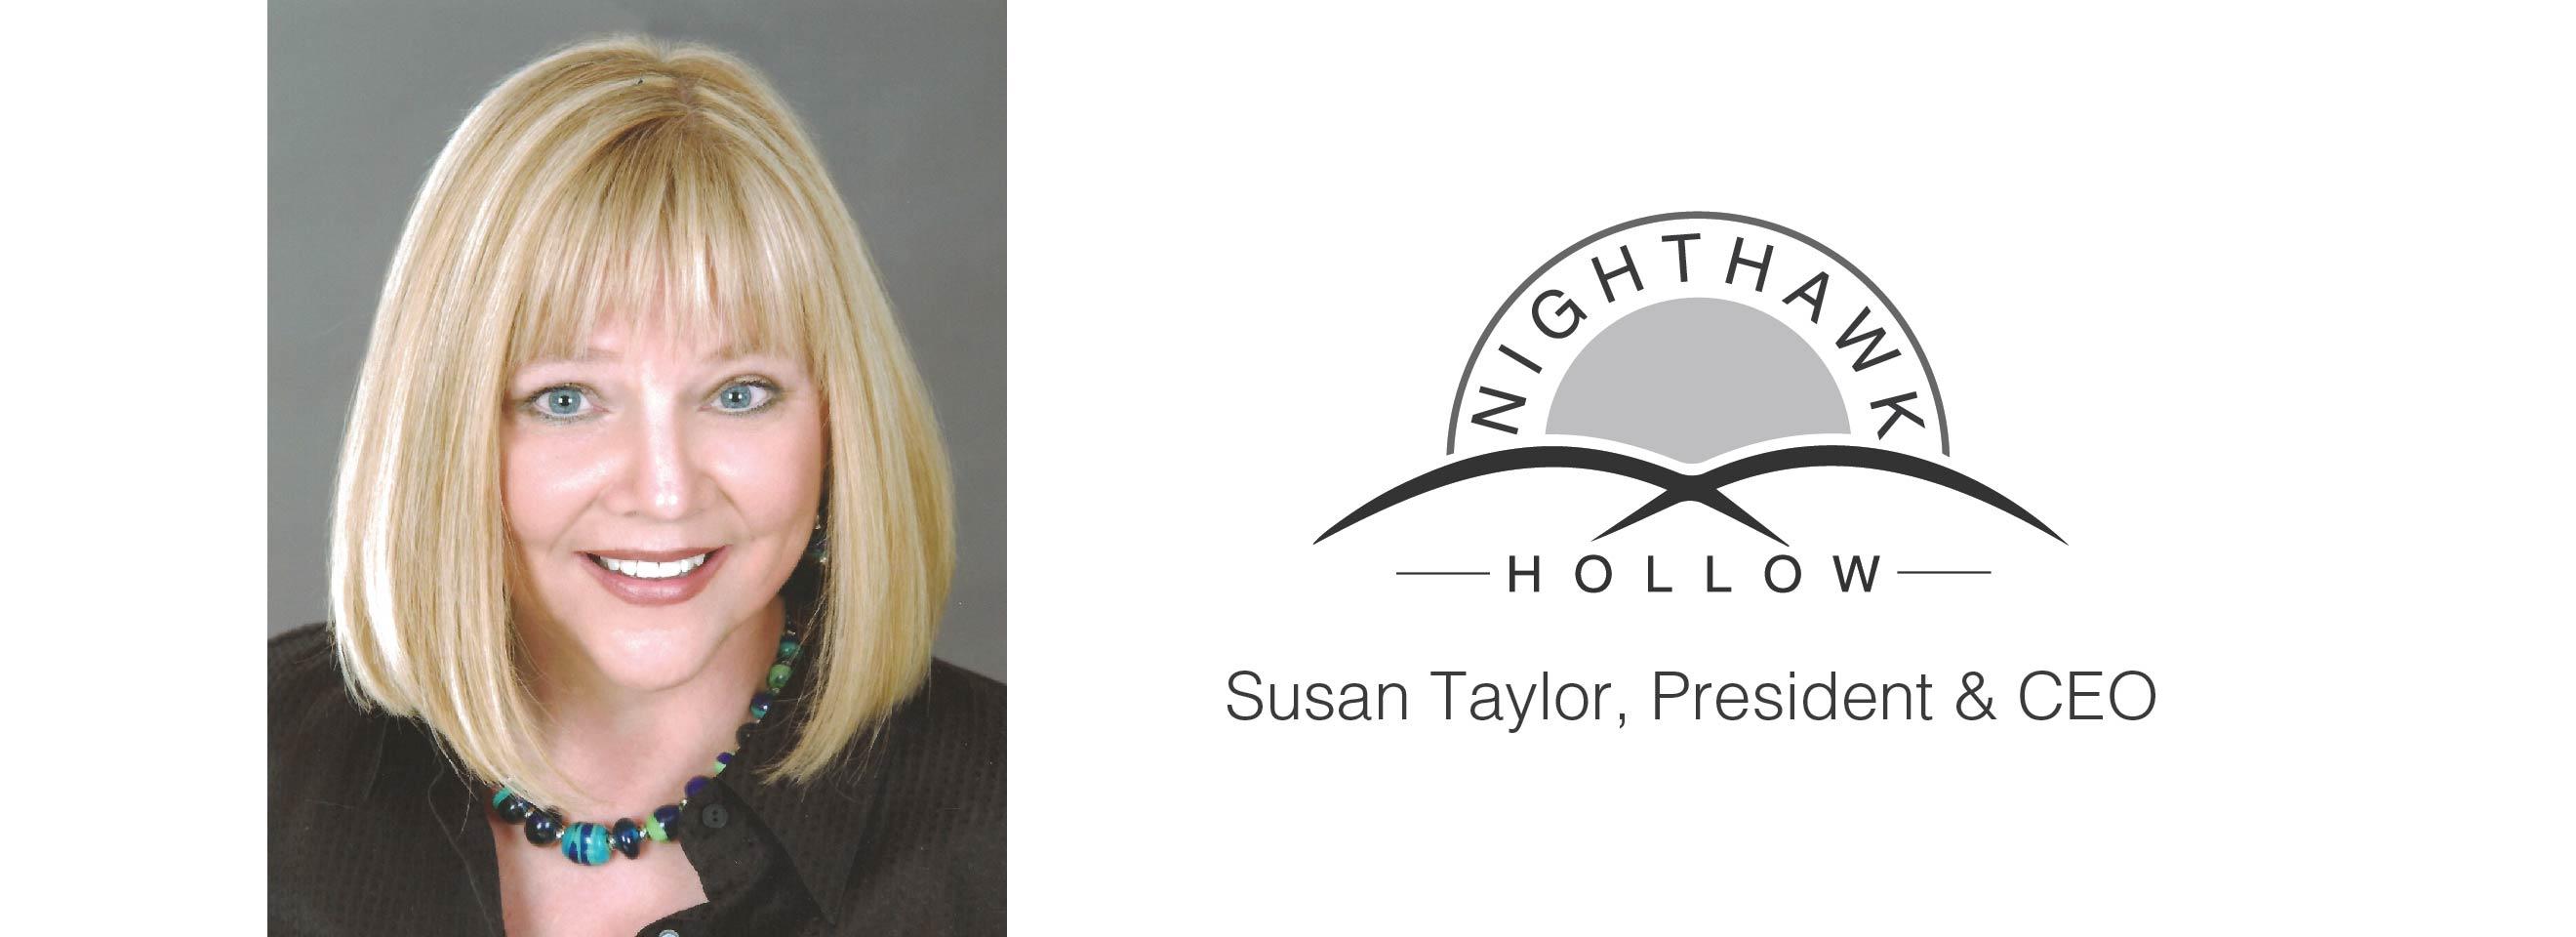 about Susan Taylor